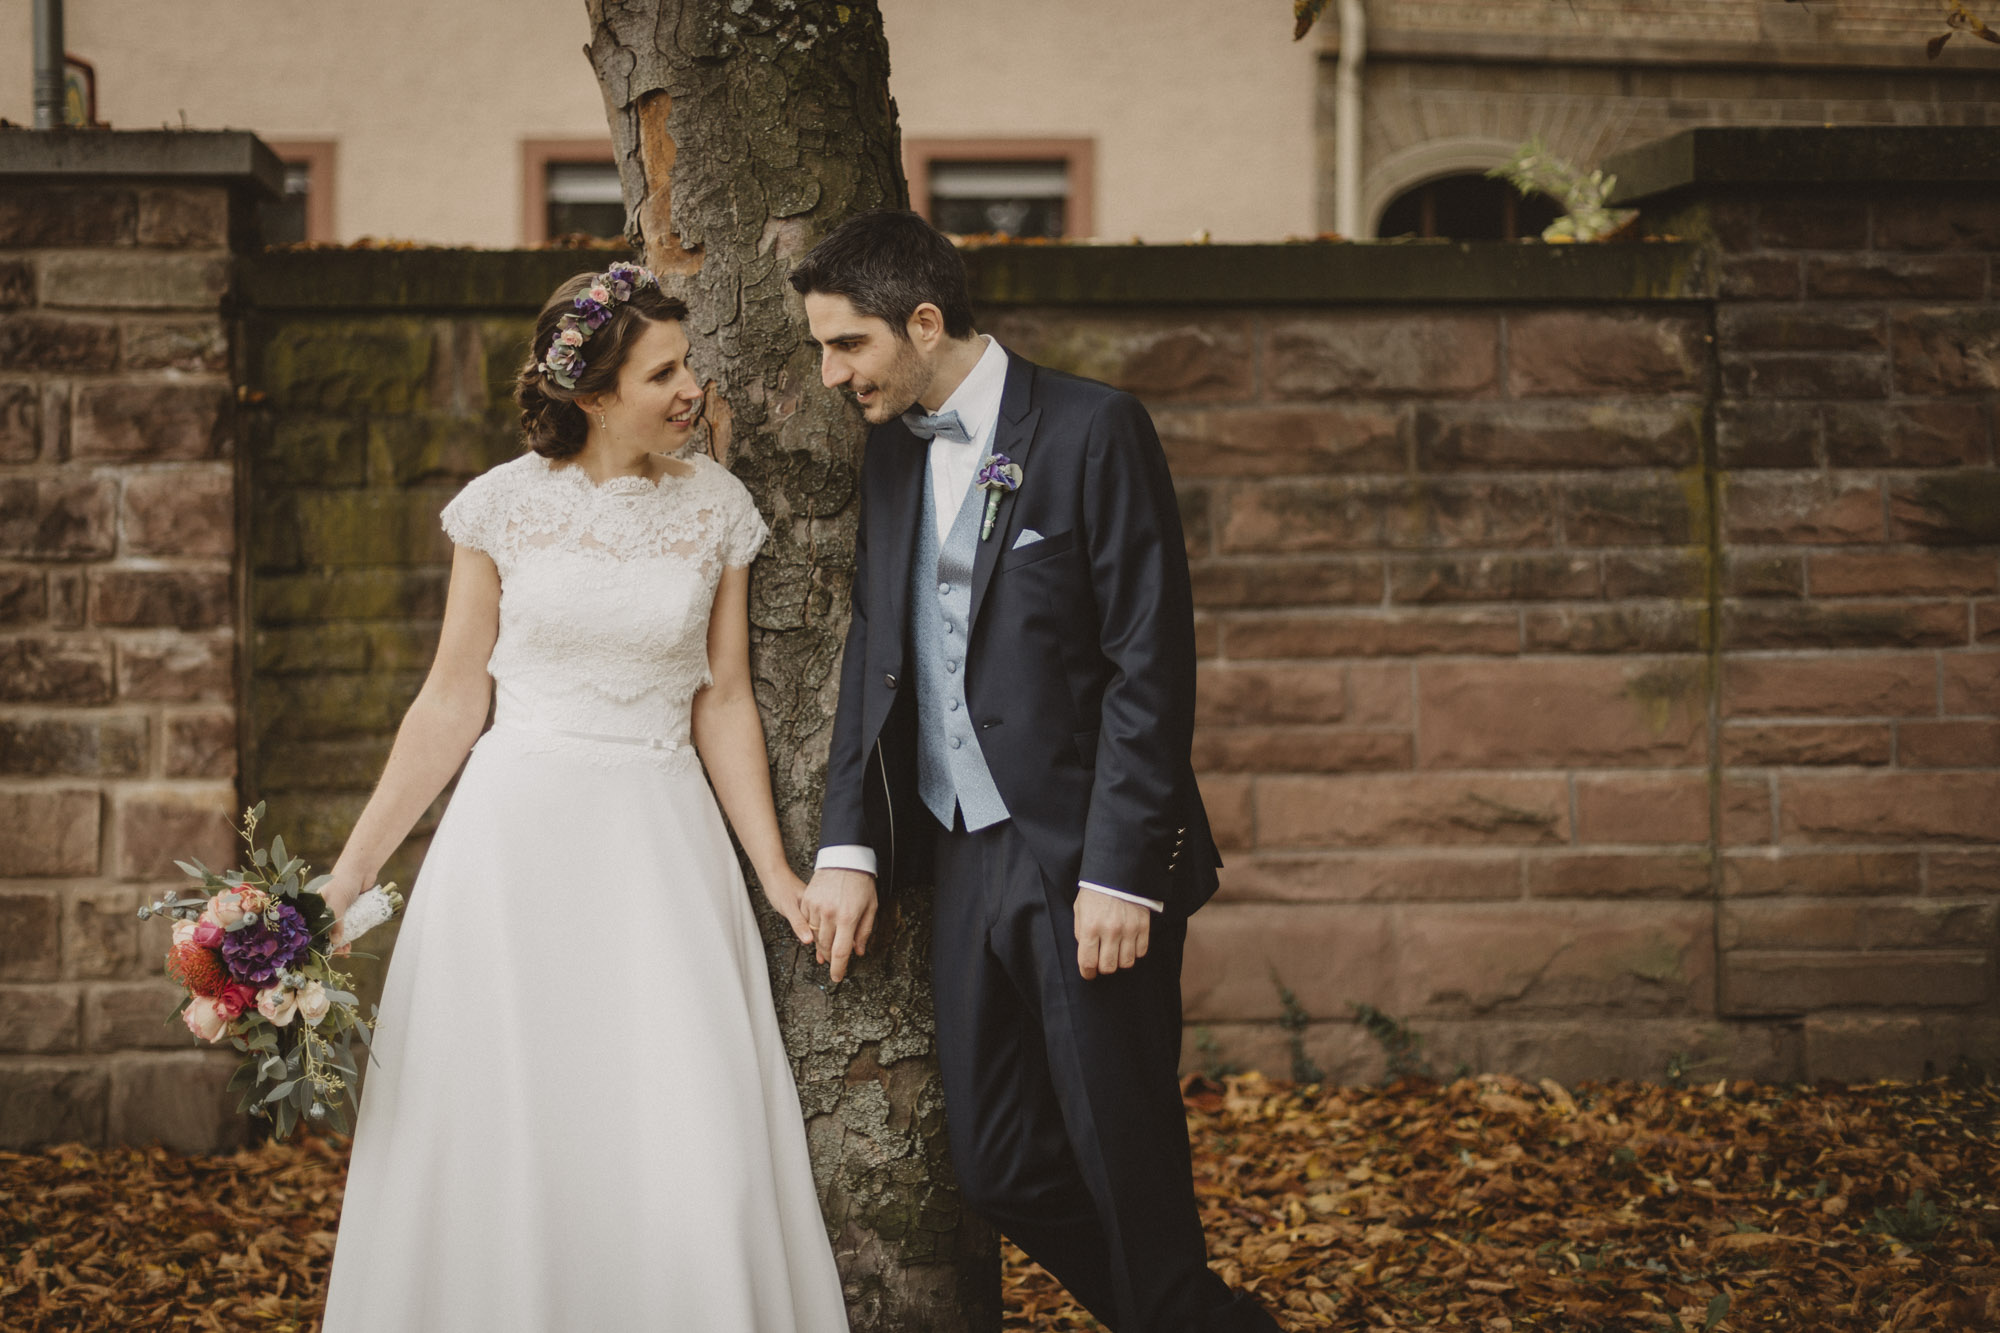 Hochzeitsfotografie-Karlsruhe-Ronja-Flo-37